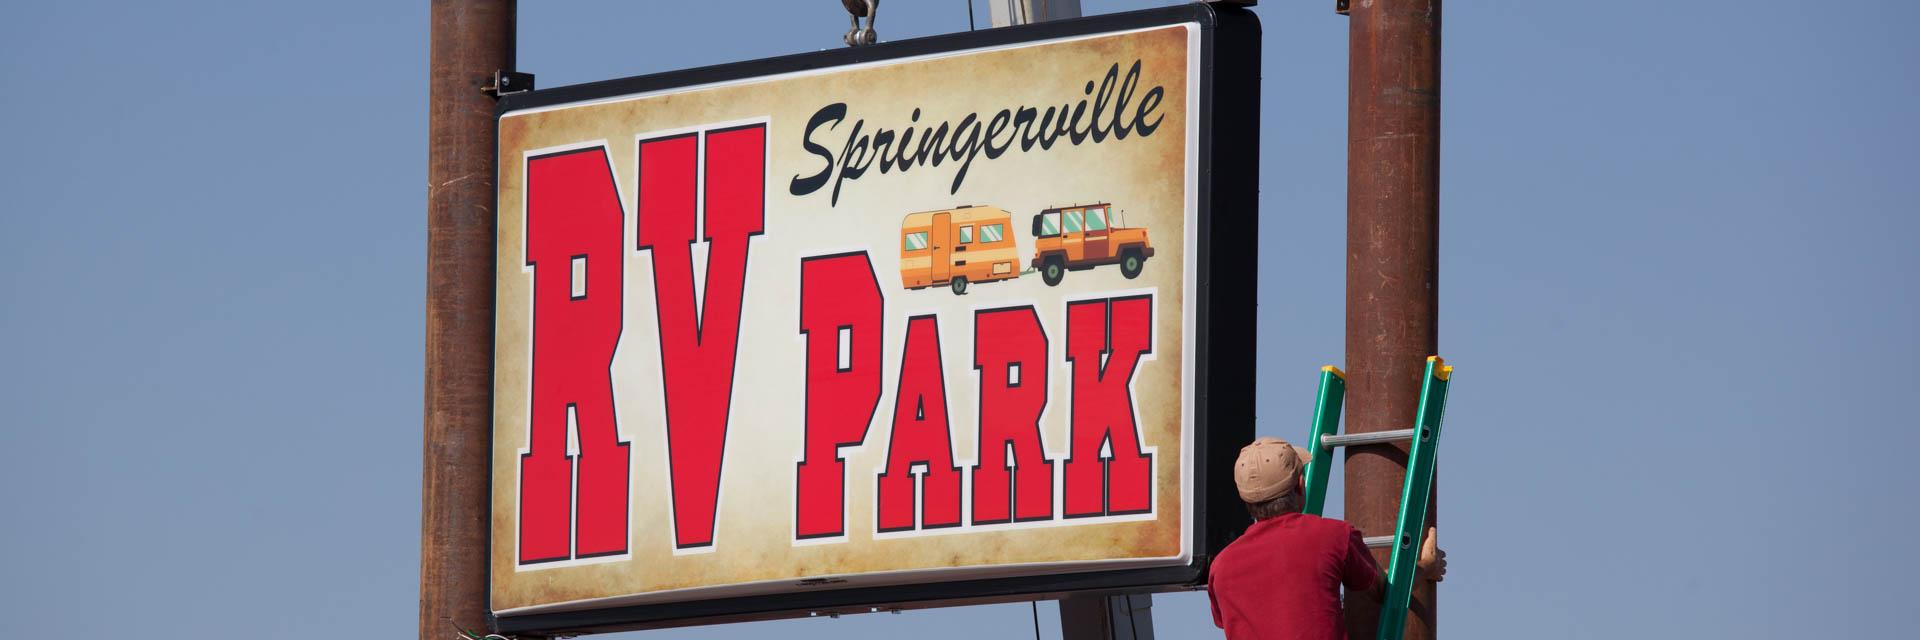 Arizona White Mountain RV Camping Springerville RV Park